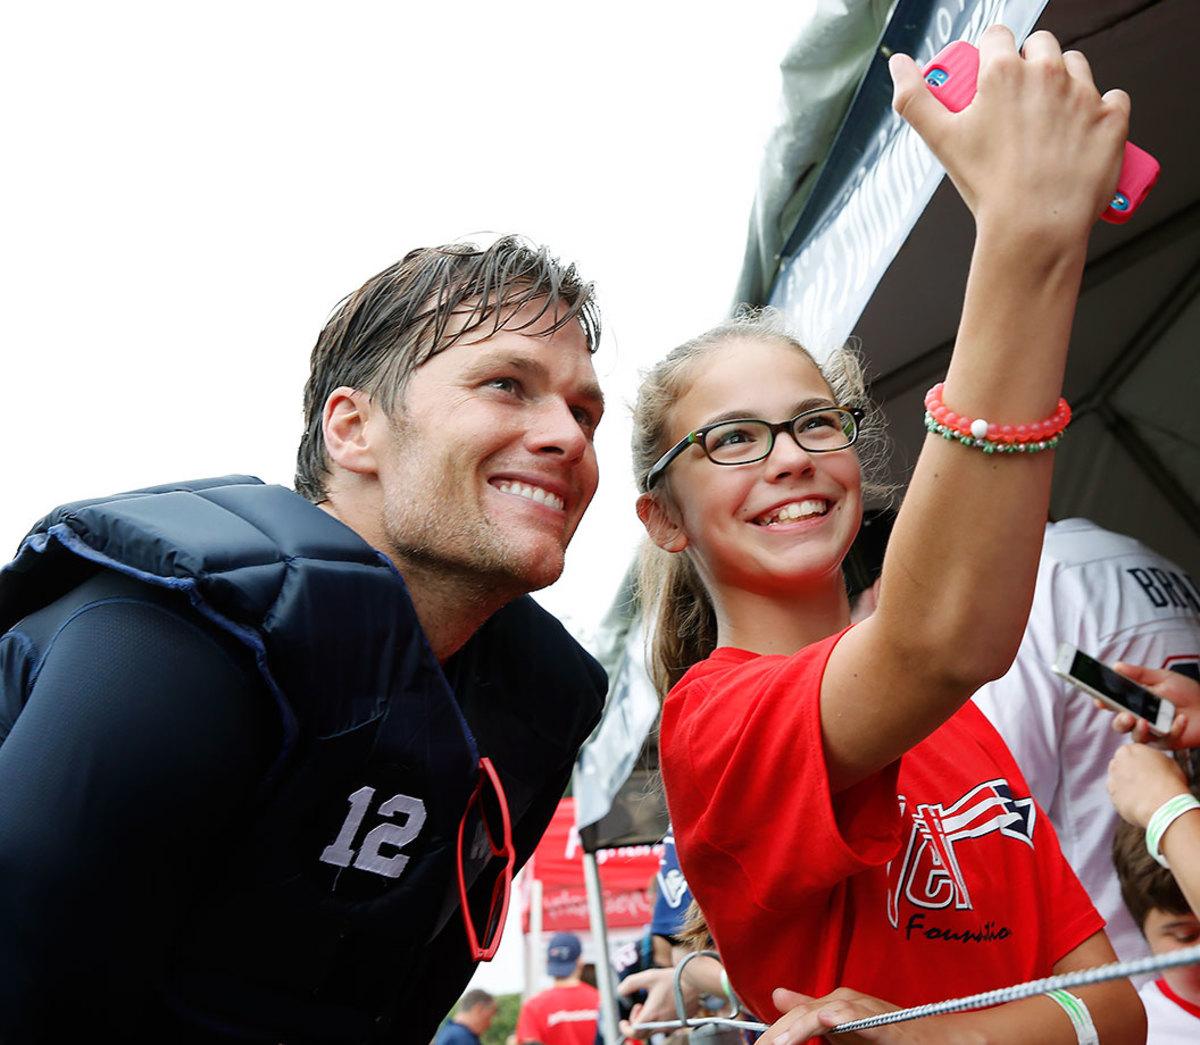 2016-0729-New-England-Patriots-training-camp-Tom-Brady-fan.jpg